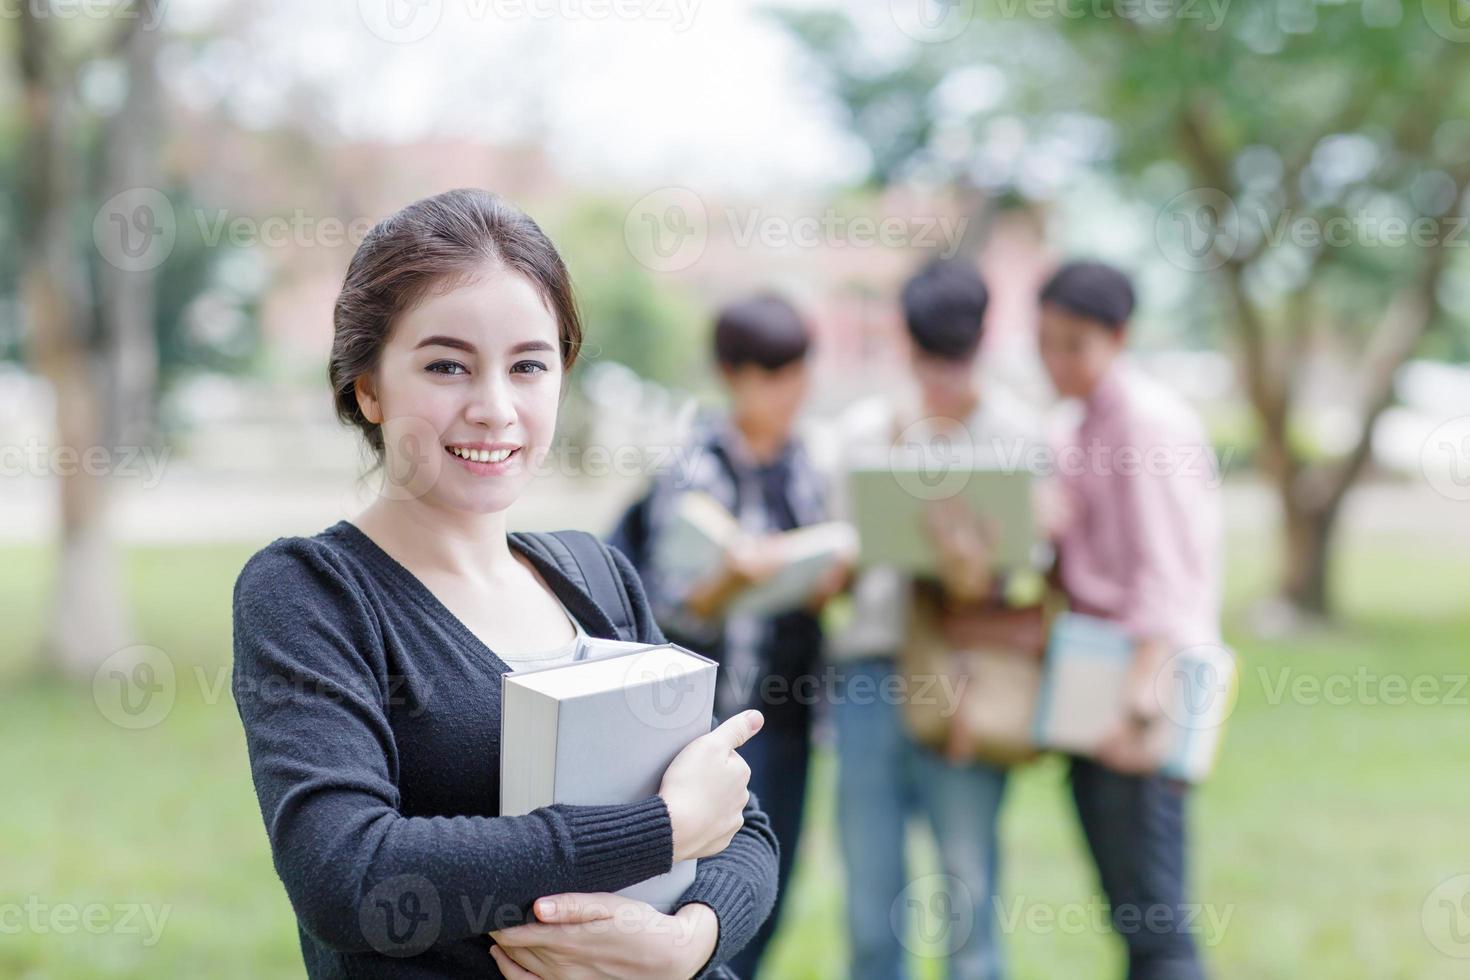 vrouwelijke student die op universiteit glimlacht foto